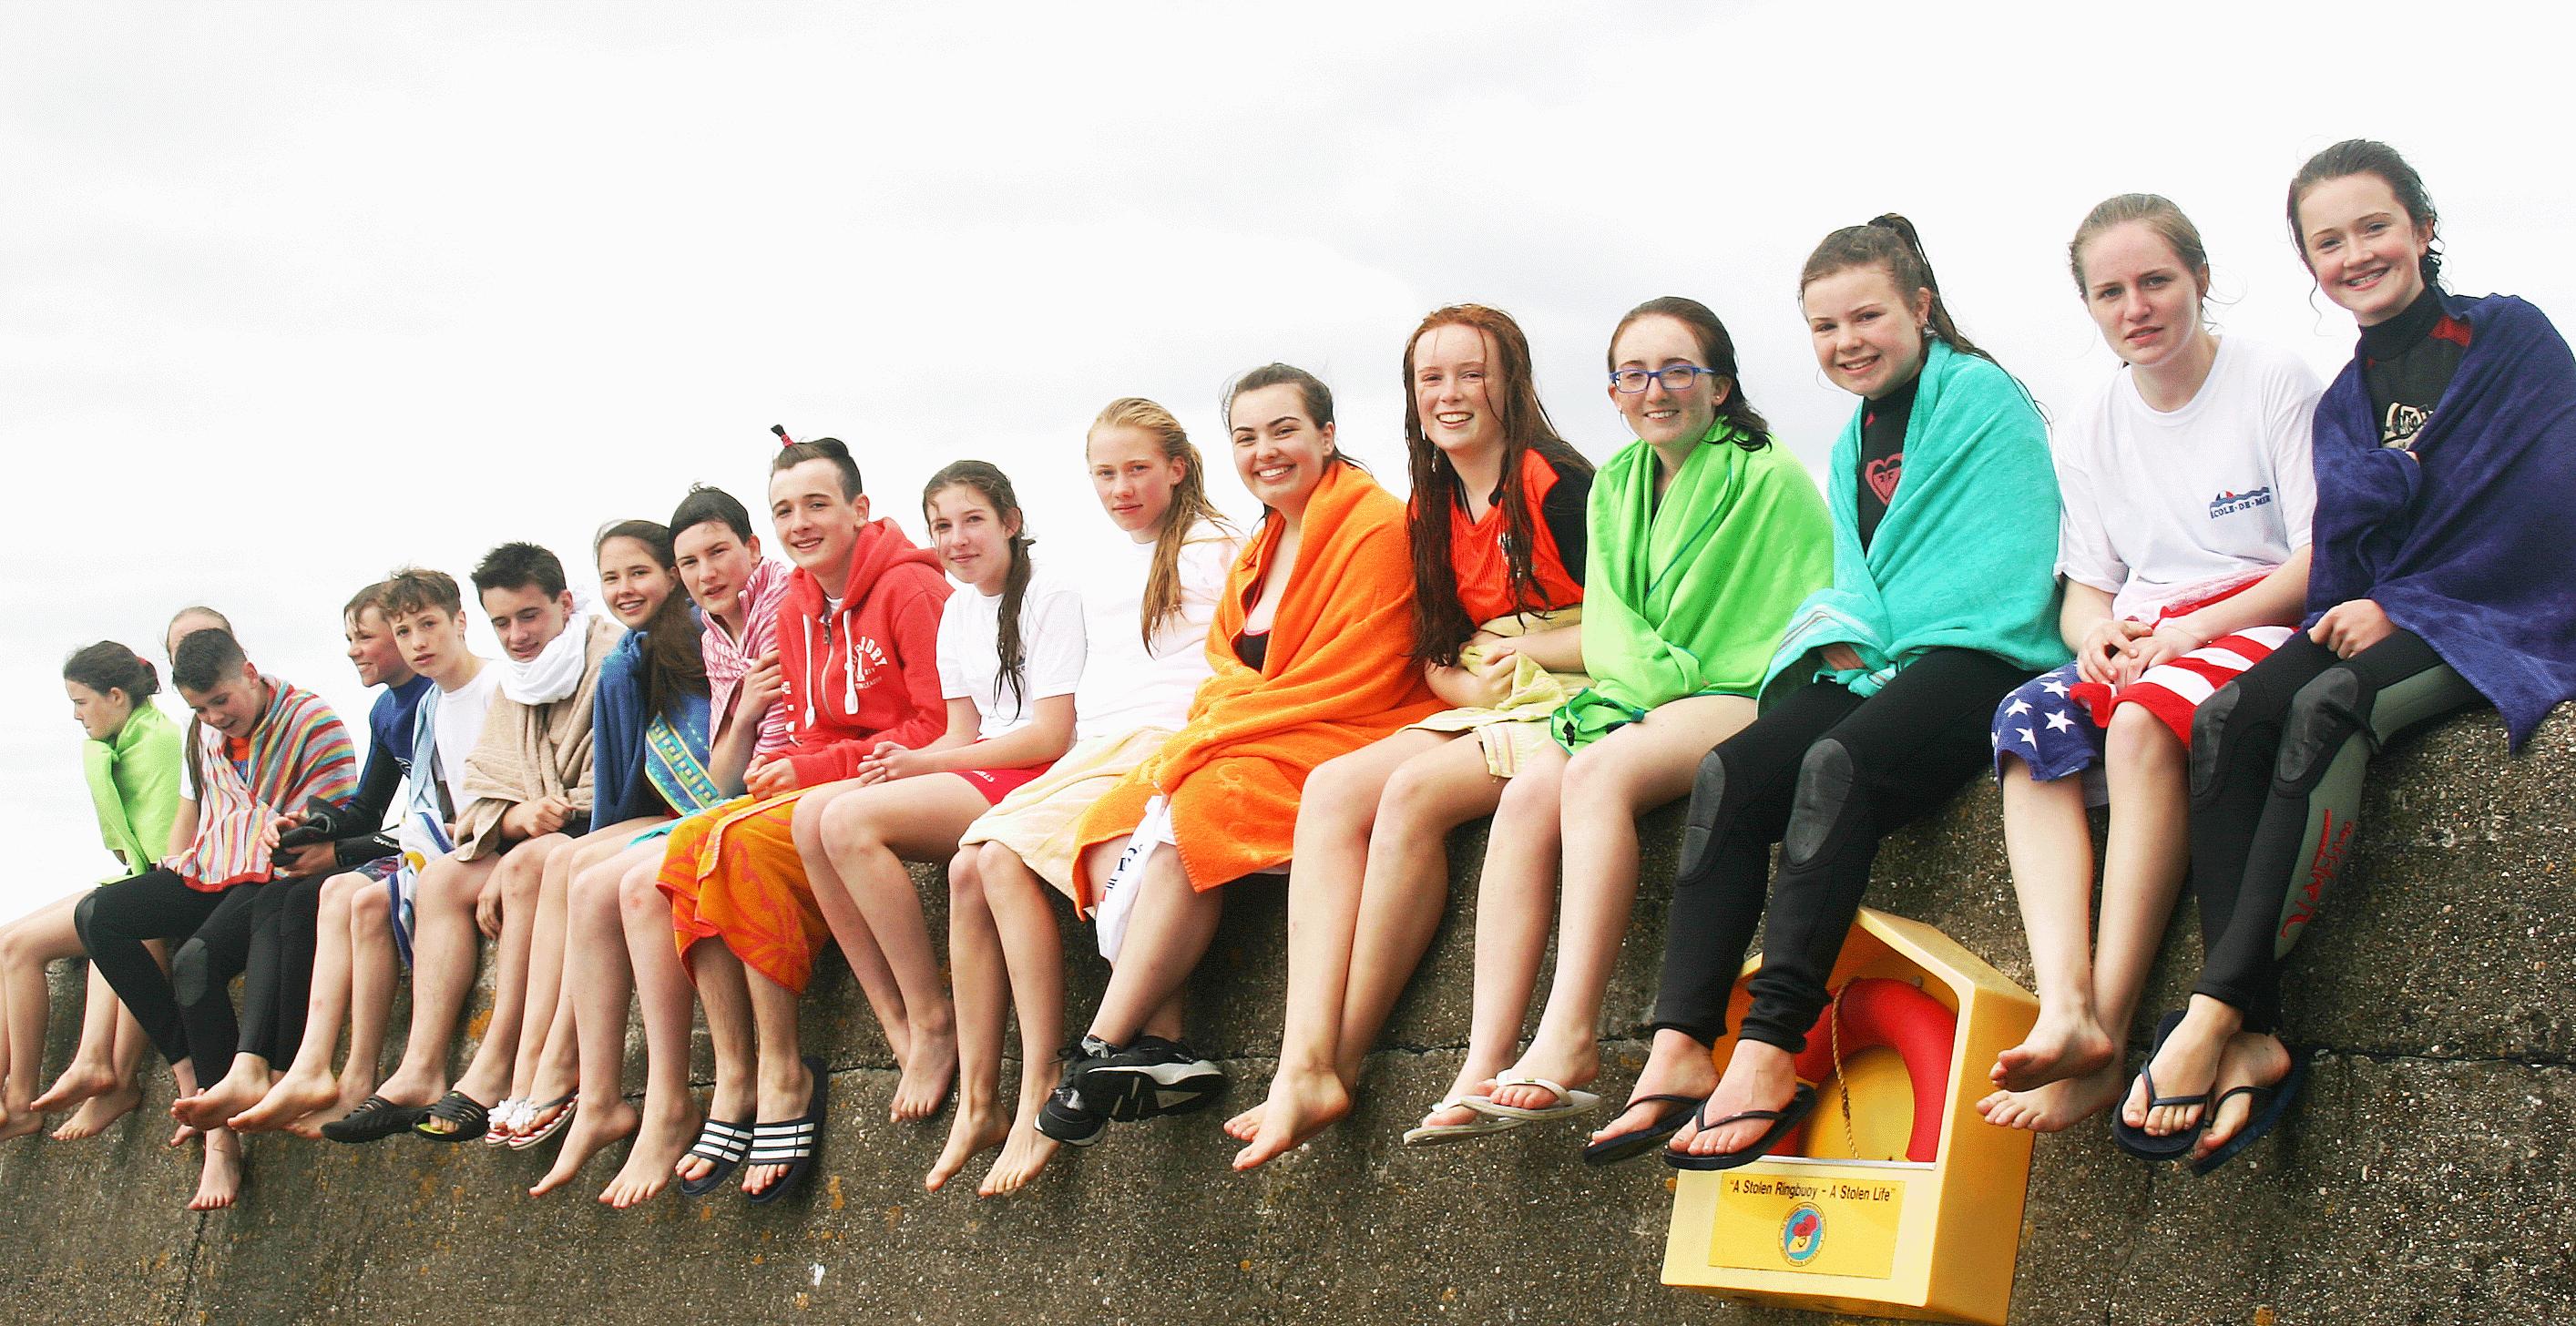 Ecole de mer students 2016